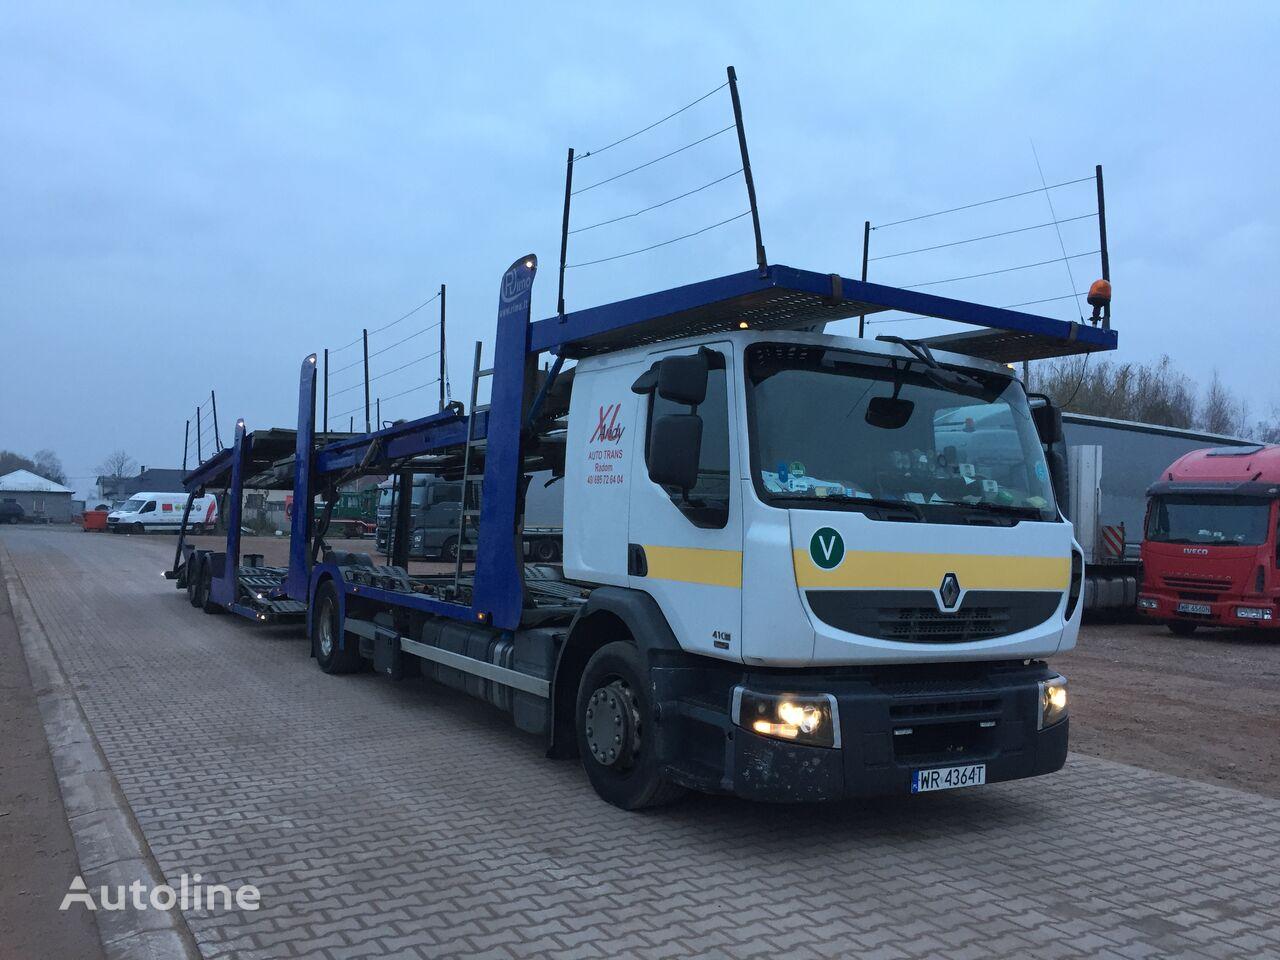 RENAULT Premium DXI 410 camión portacoches + remolque portacoches